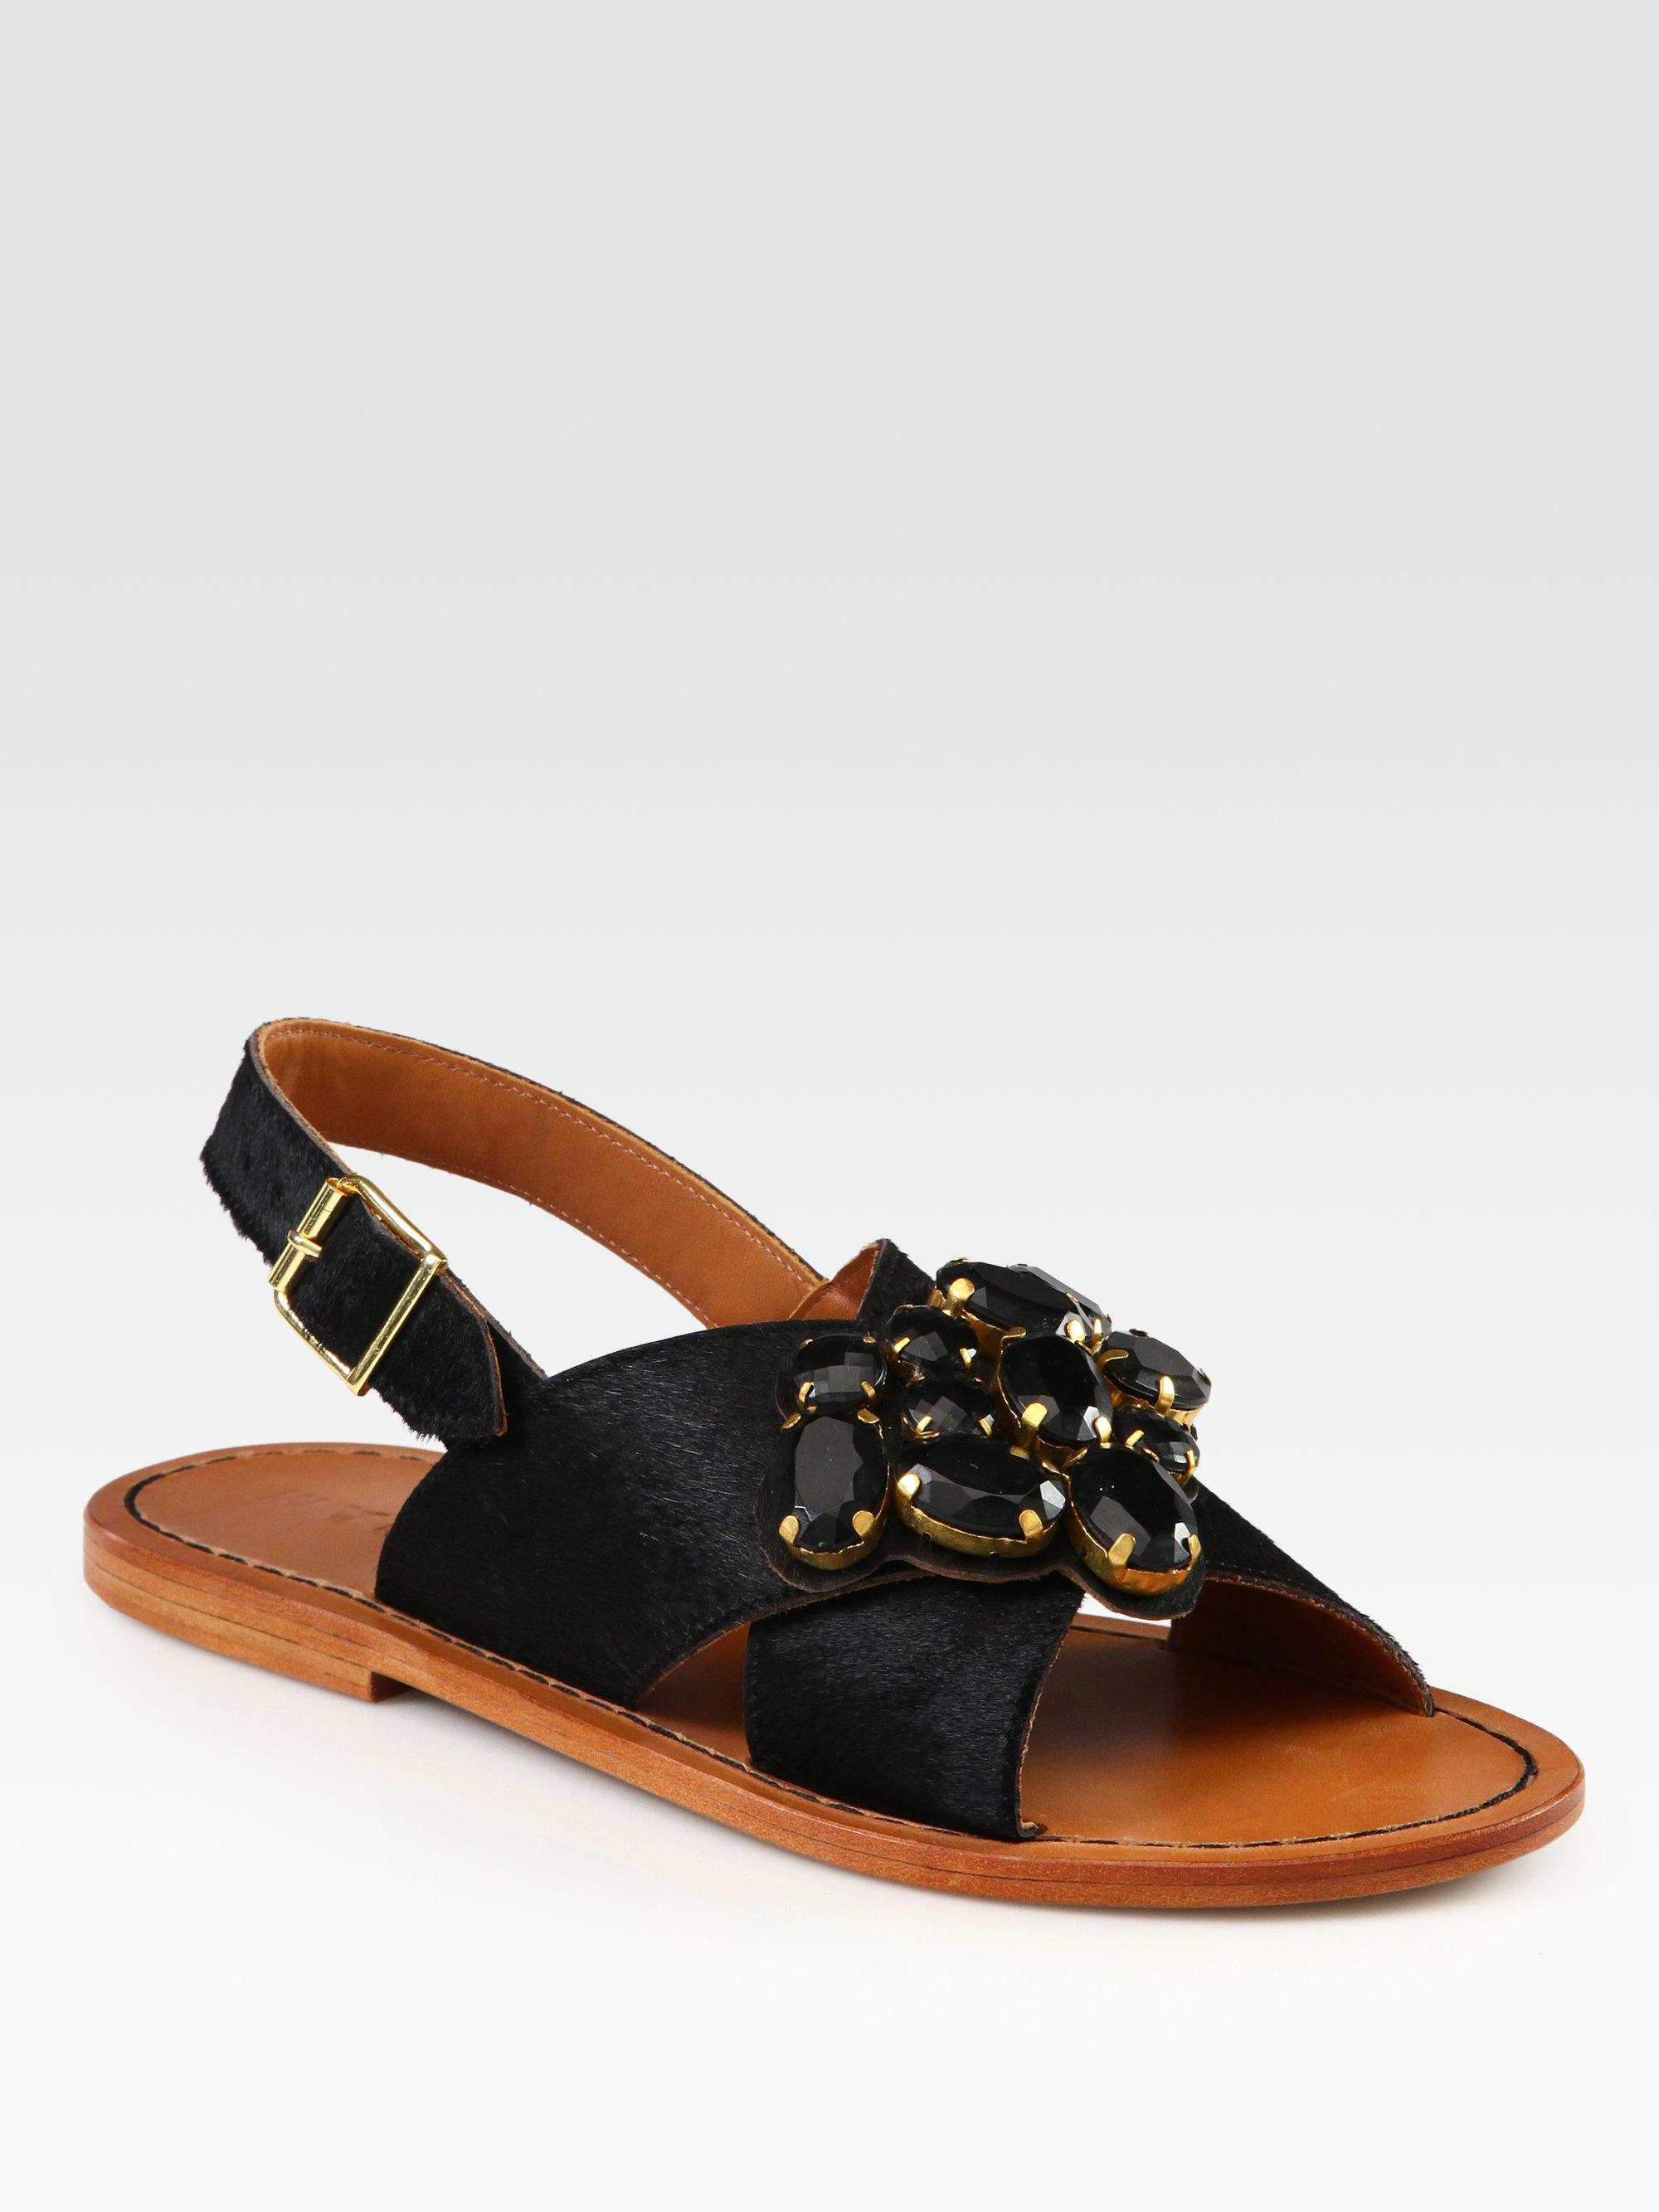 f1ed6cf0e Lyst - Marni Jeweled Calf Hair Crisscross Sandals in Black